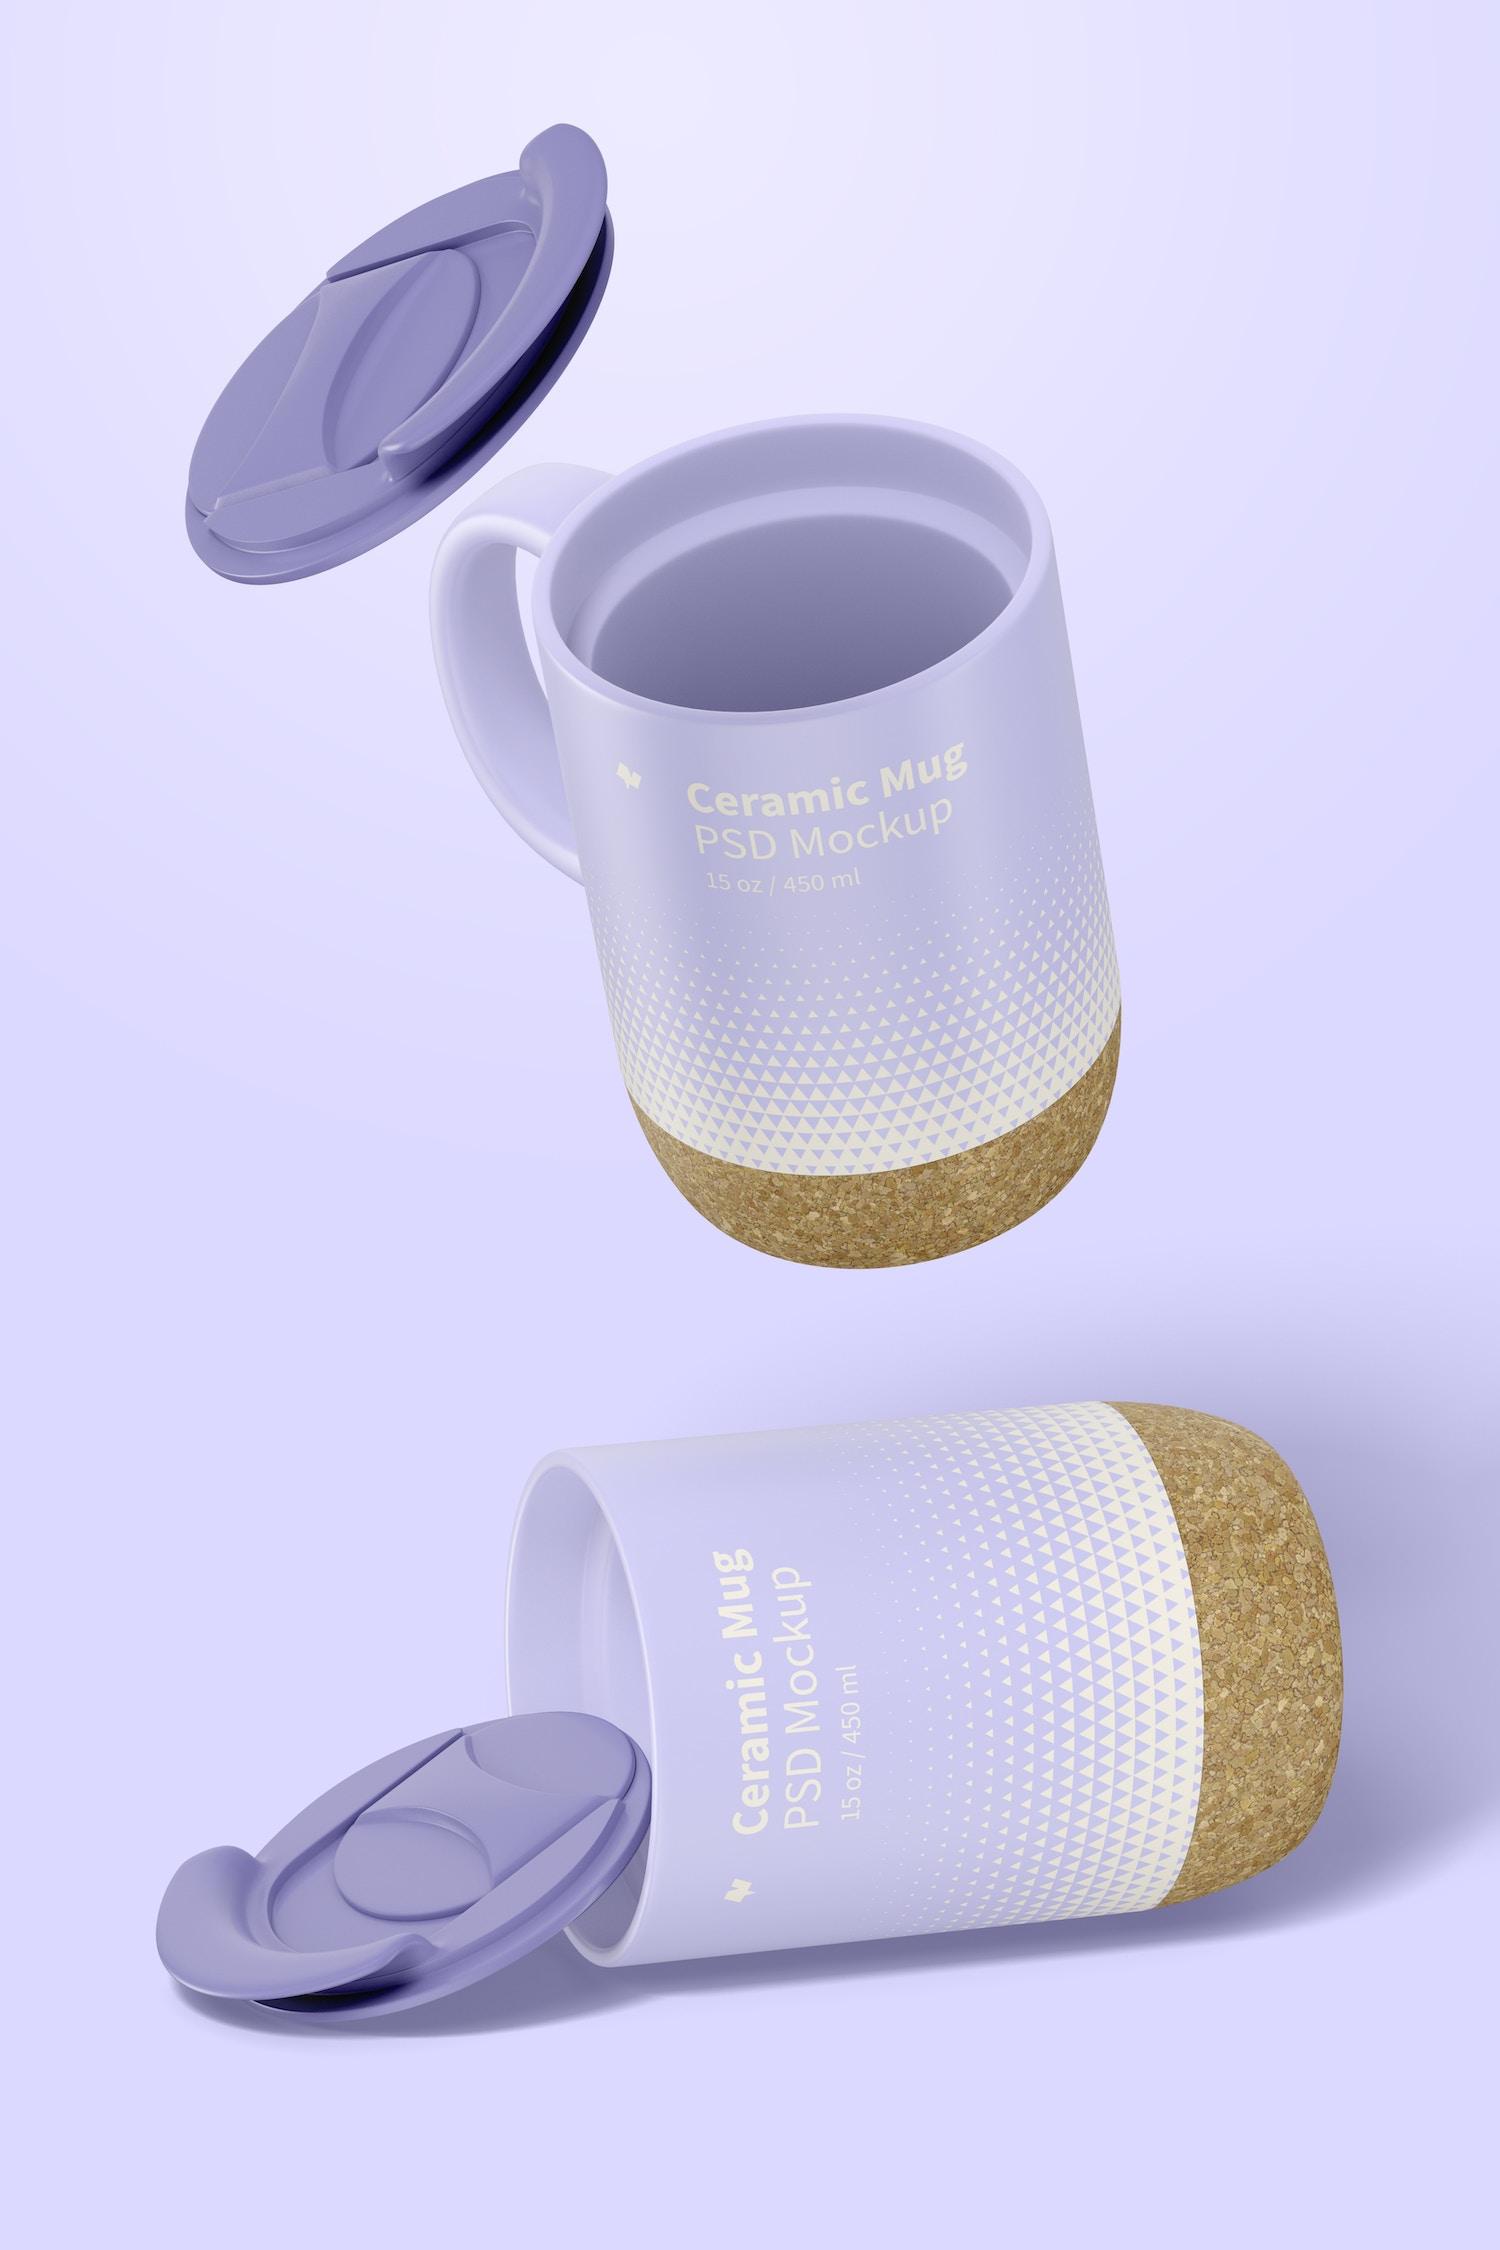 15 oz Ceramic Mug with Lid Mockup, Opened